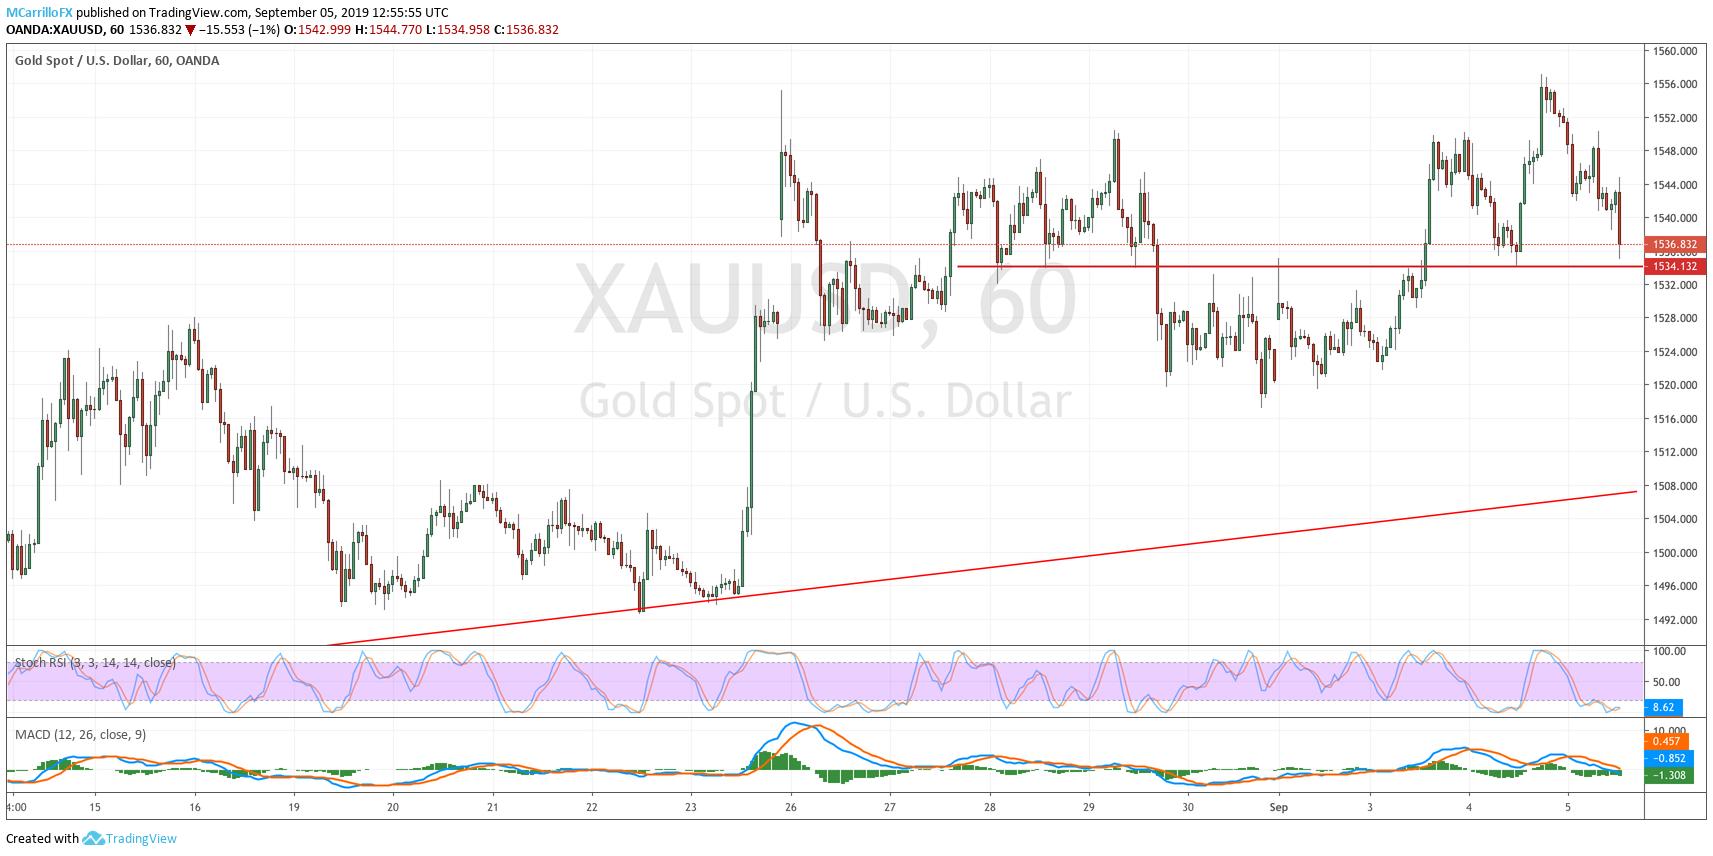 XAUUSD Gold 1-hour chart September 5